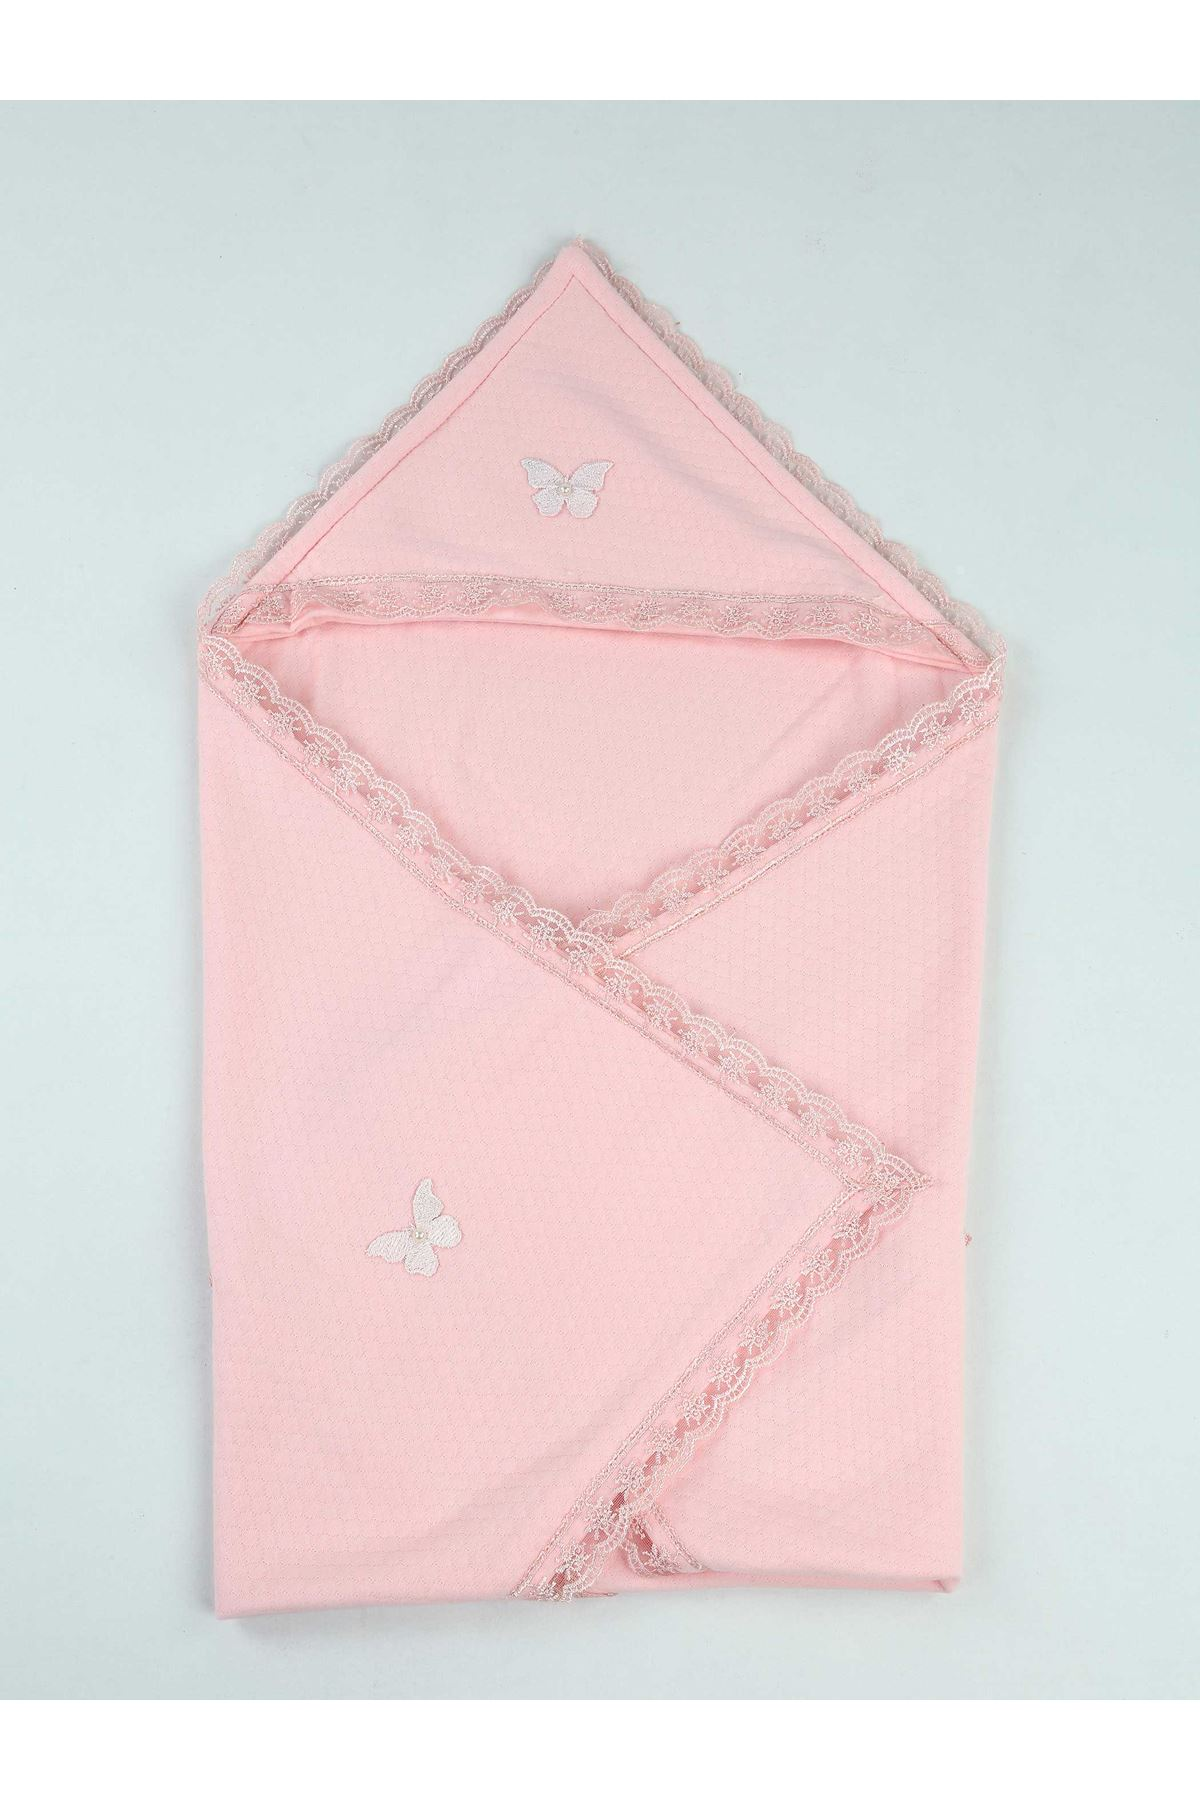 Pink 85 X85 Cm Girl Baby Swaddle Blanket